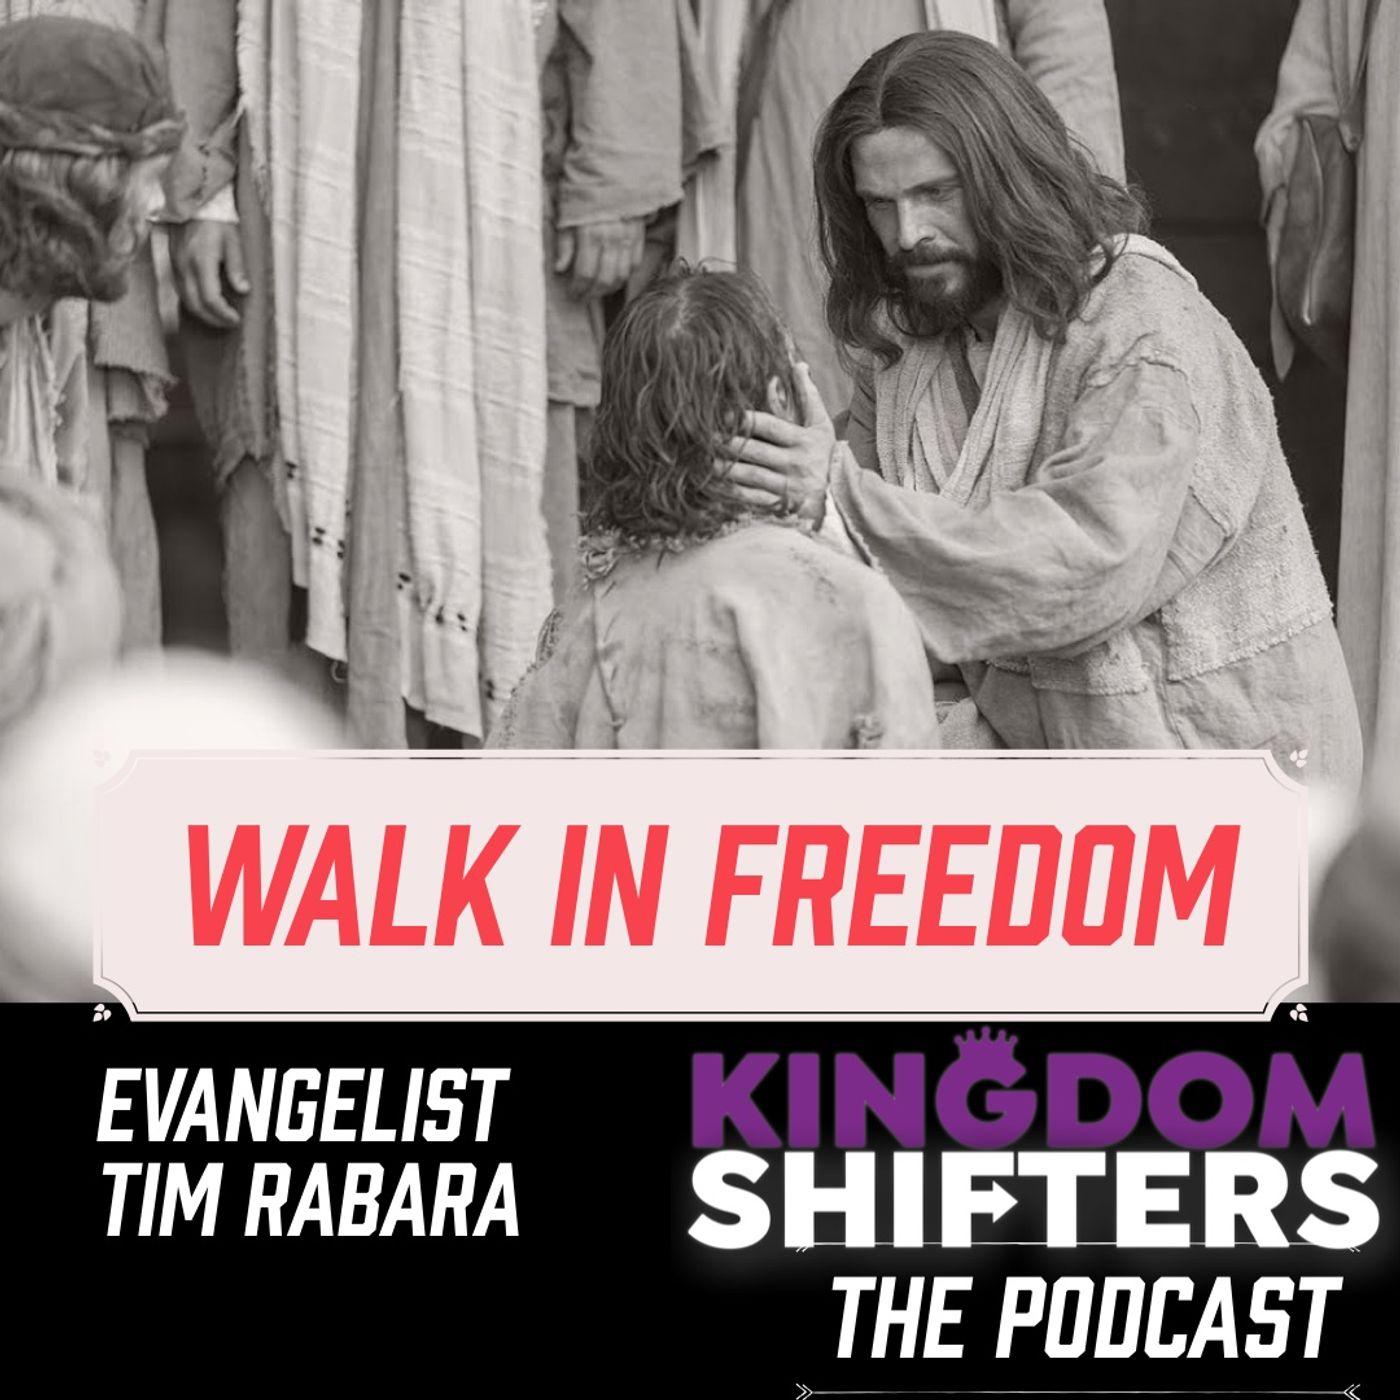 Kingdom Shifters The Podcast : Walk In Freedom | Evangelist Tim Rabara